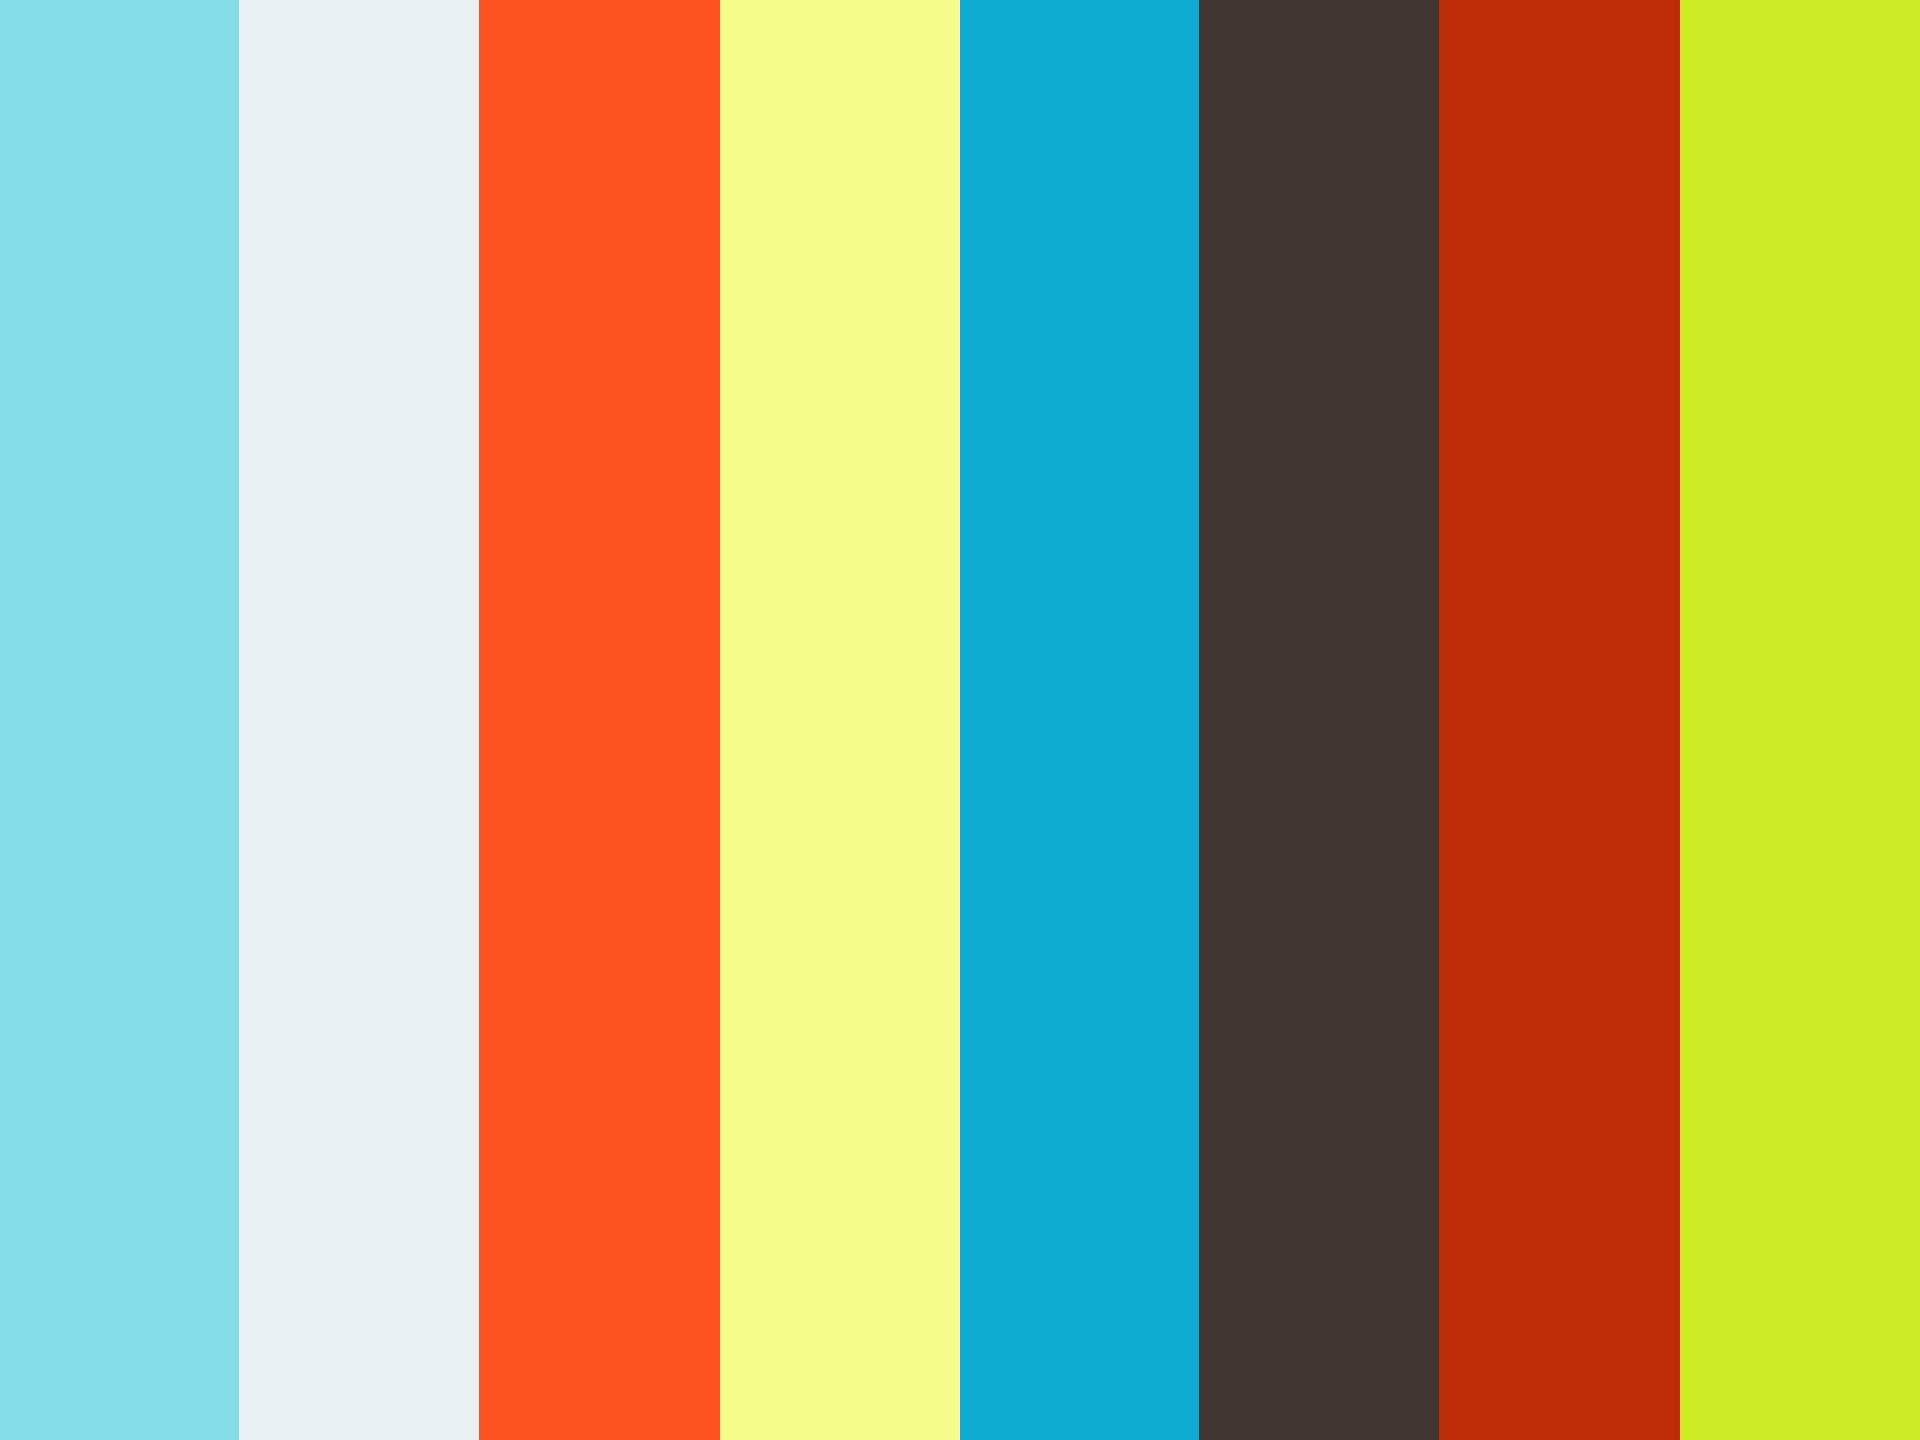 Backscatter FLIP4 Filter Installation Guide for GoPro